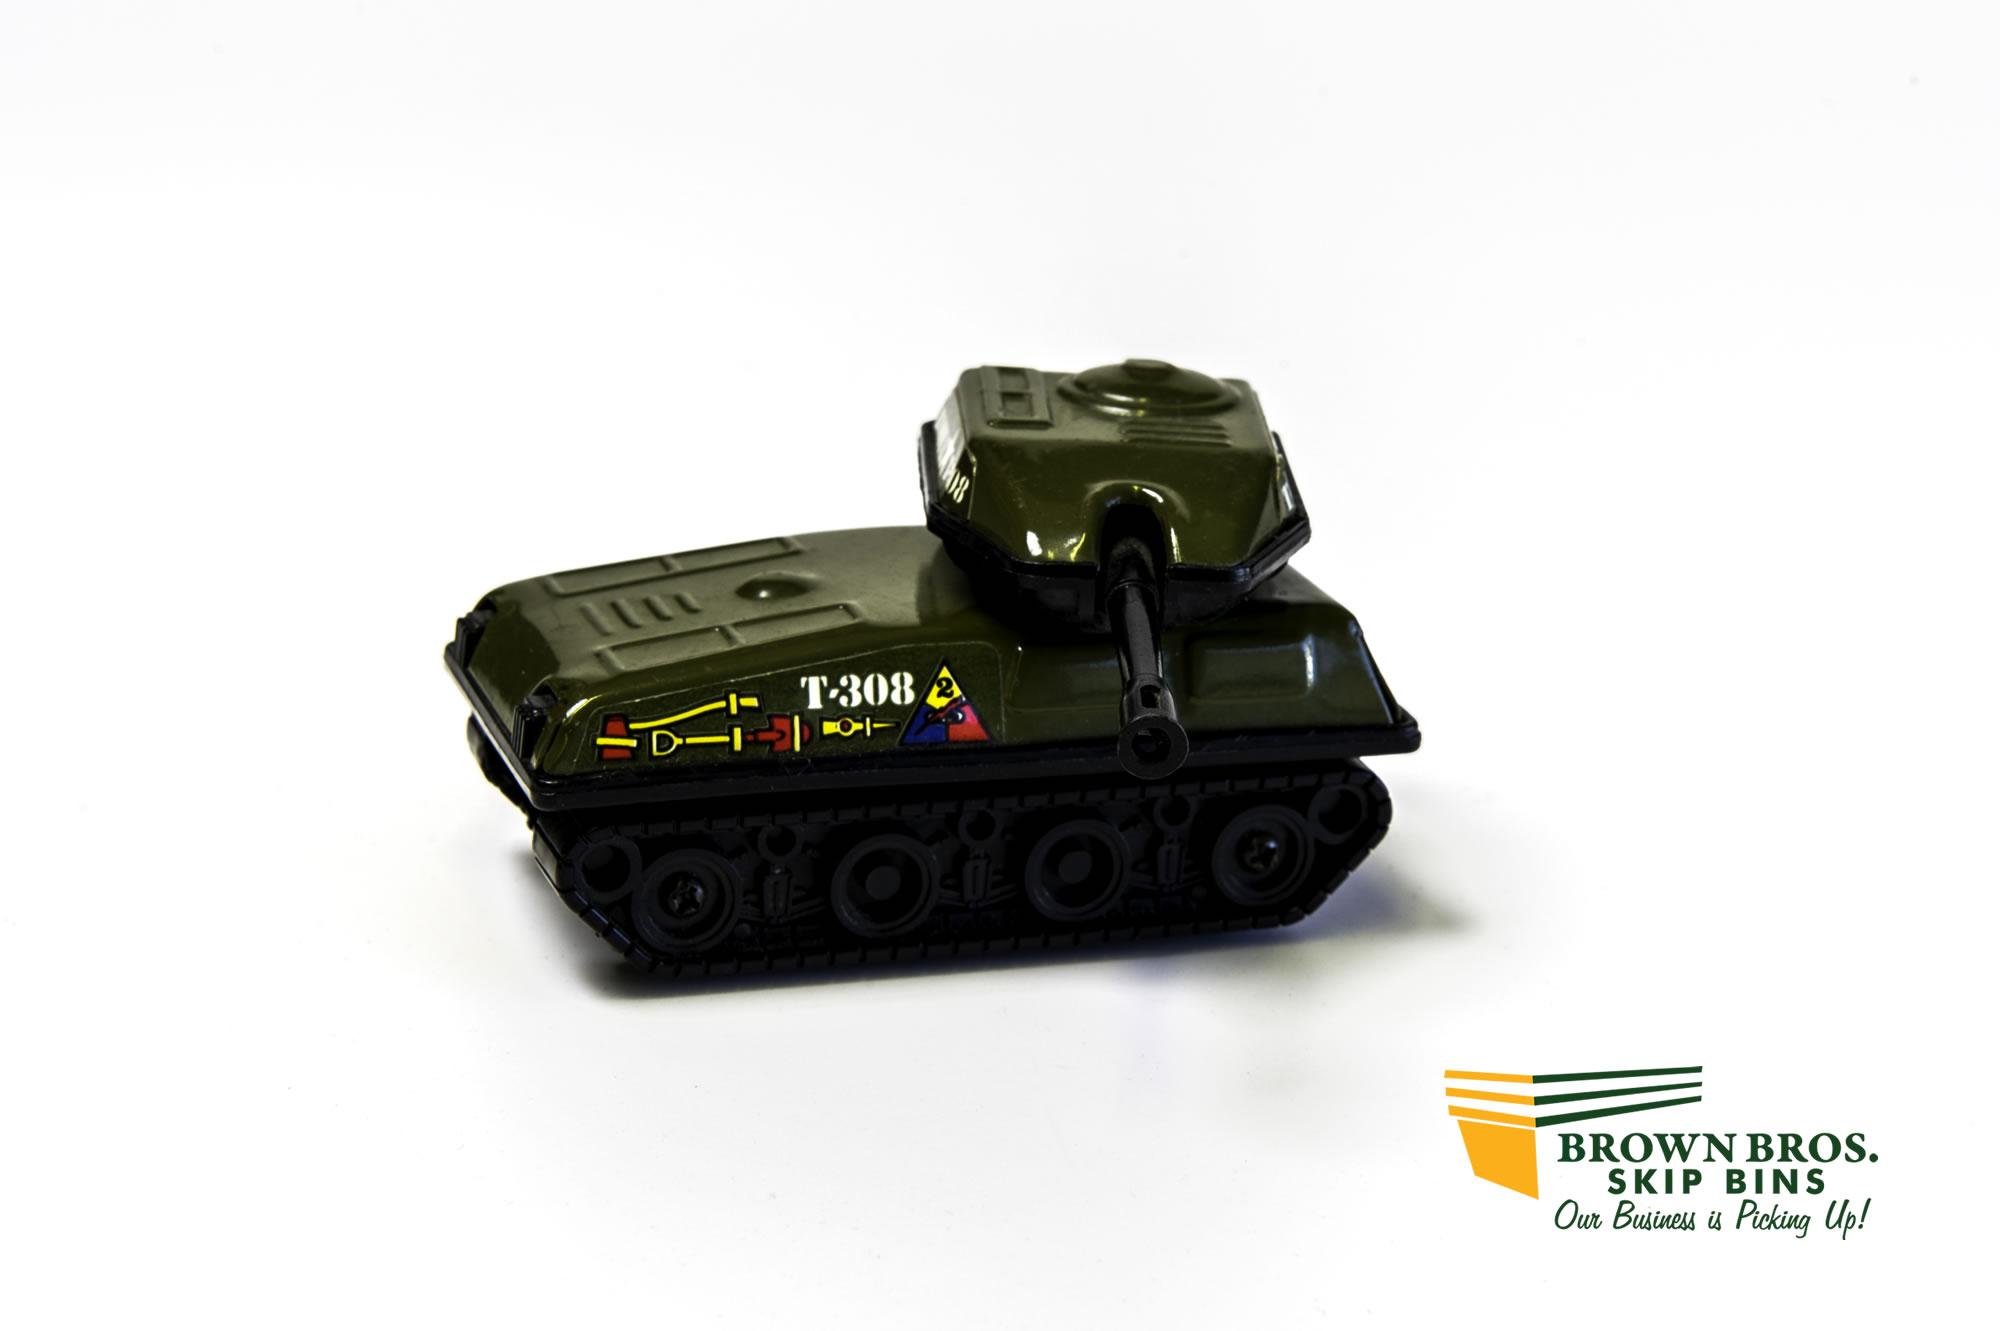 Buddy LT 308 Tank